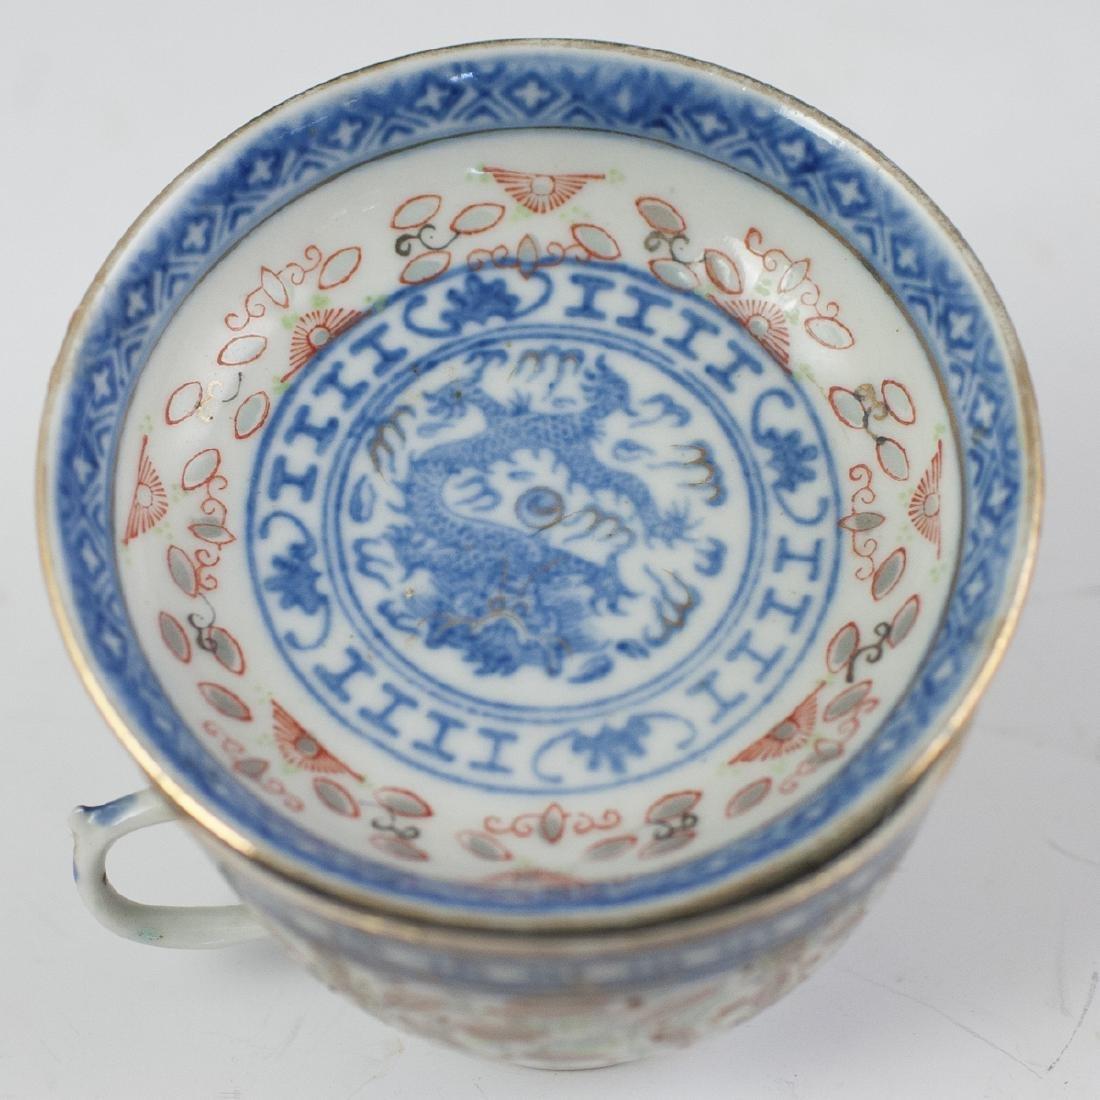 Chinese Porcelain De Riz Ware Demitasse Set - 4